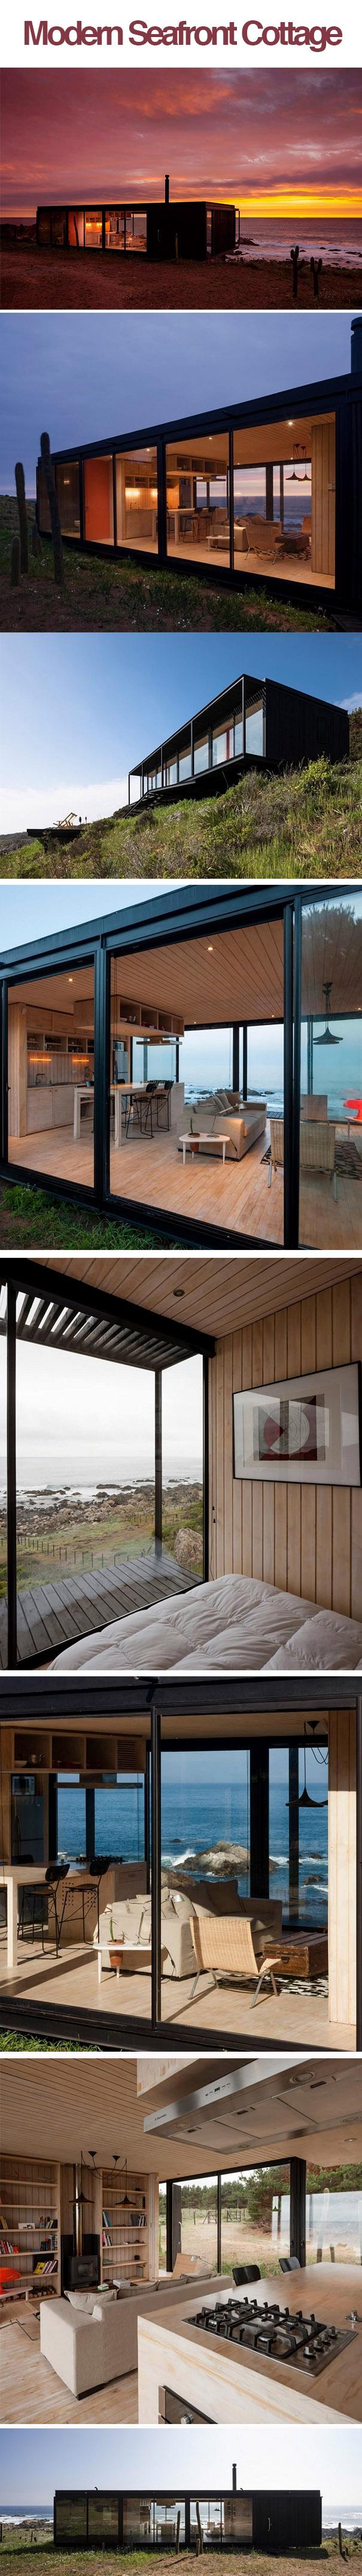 modern seaside cottage updated